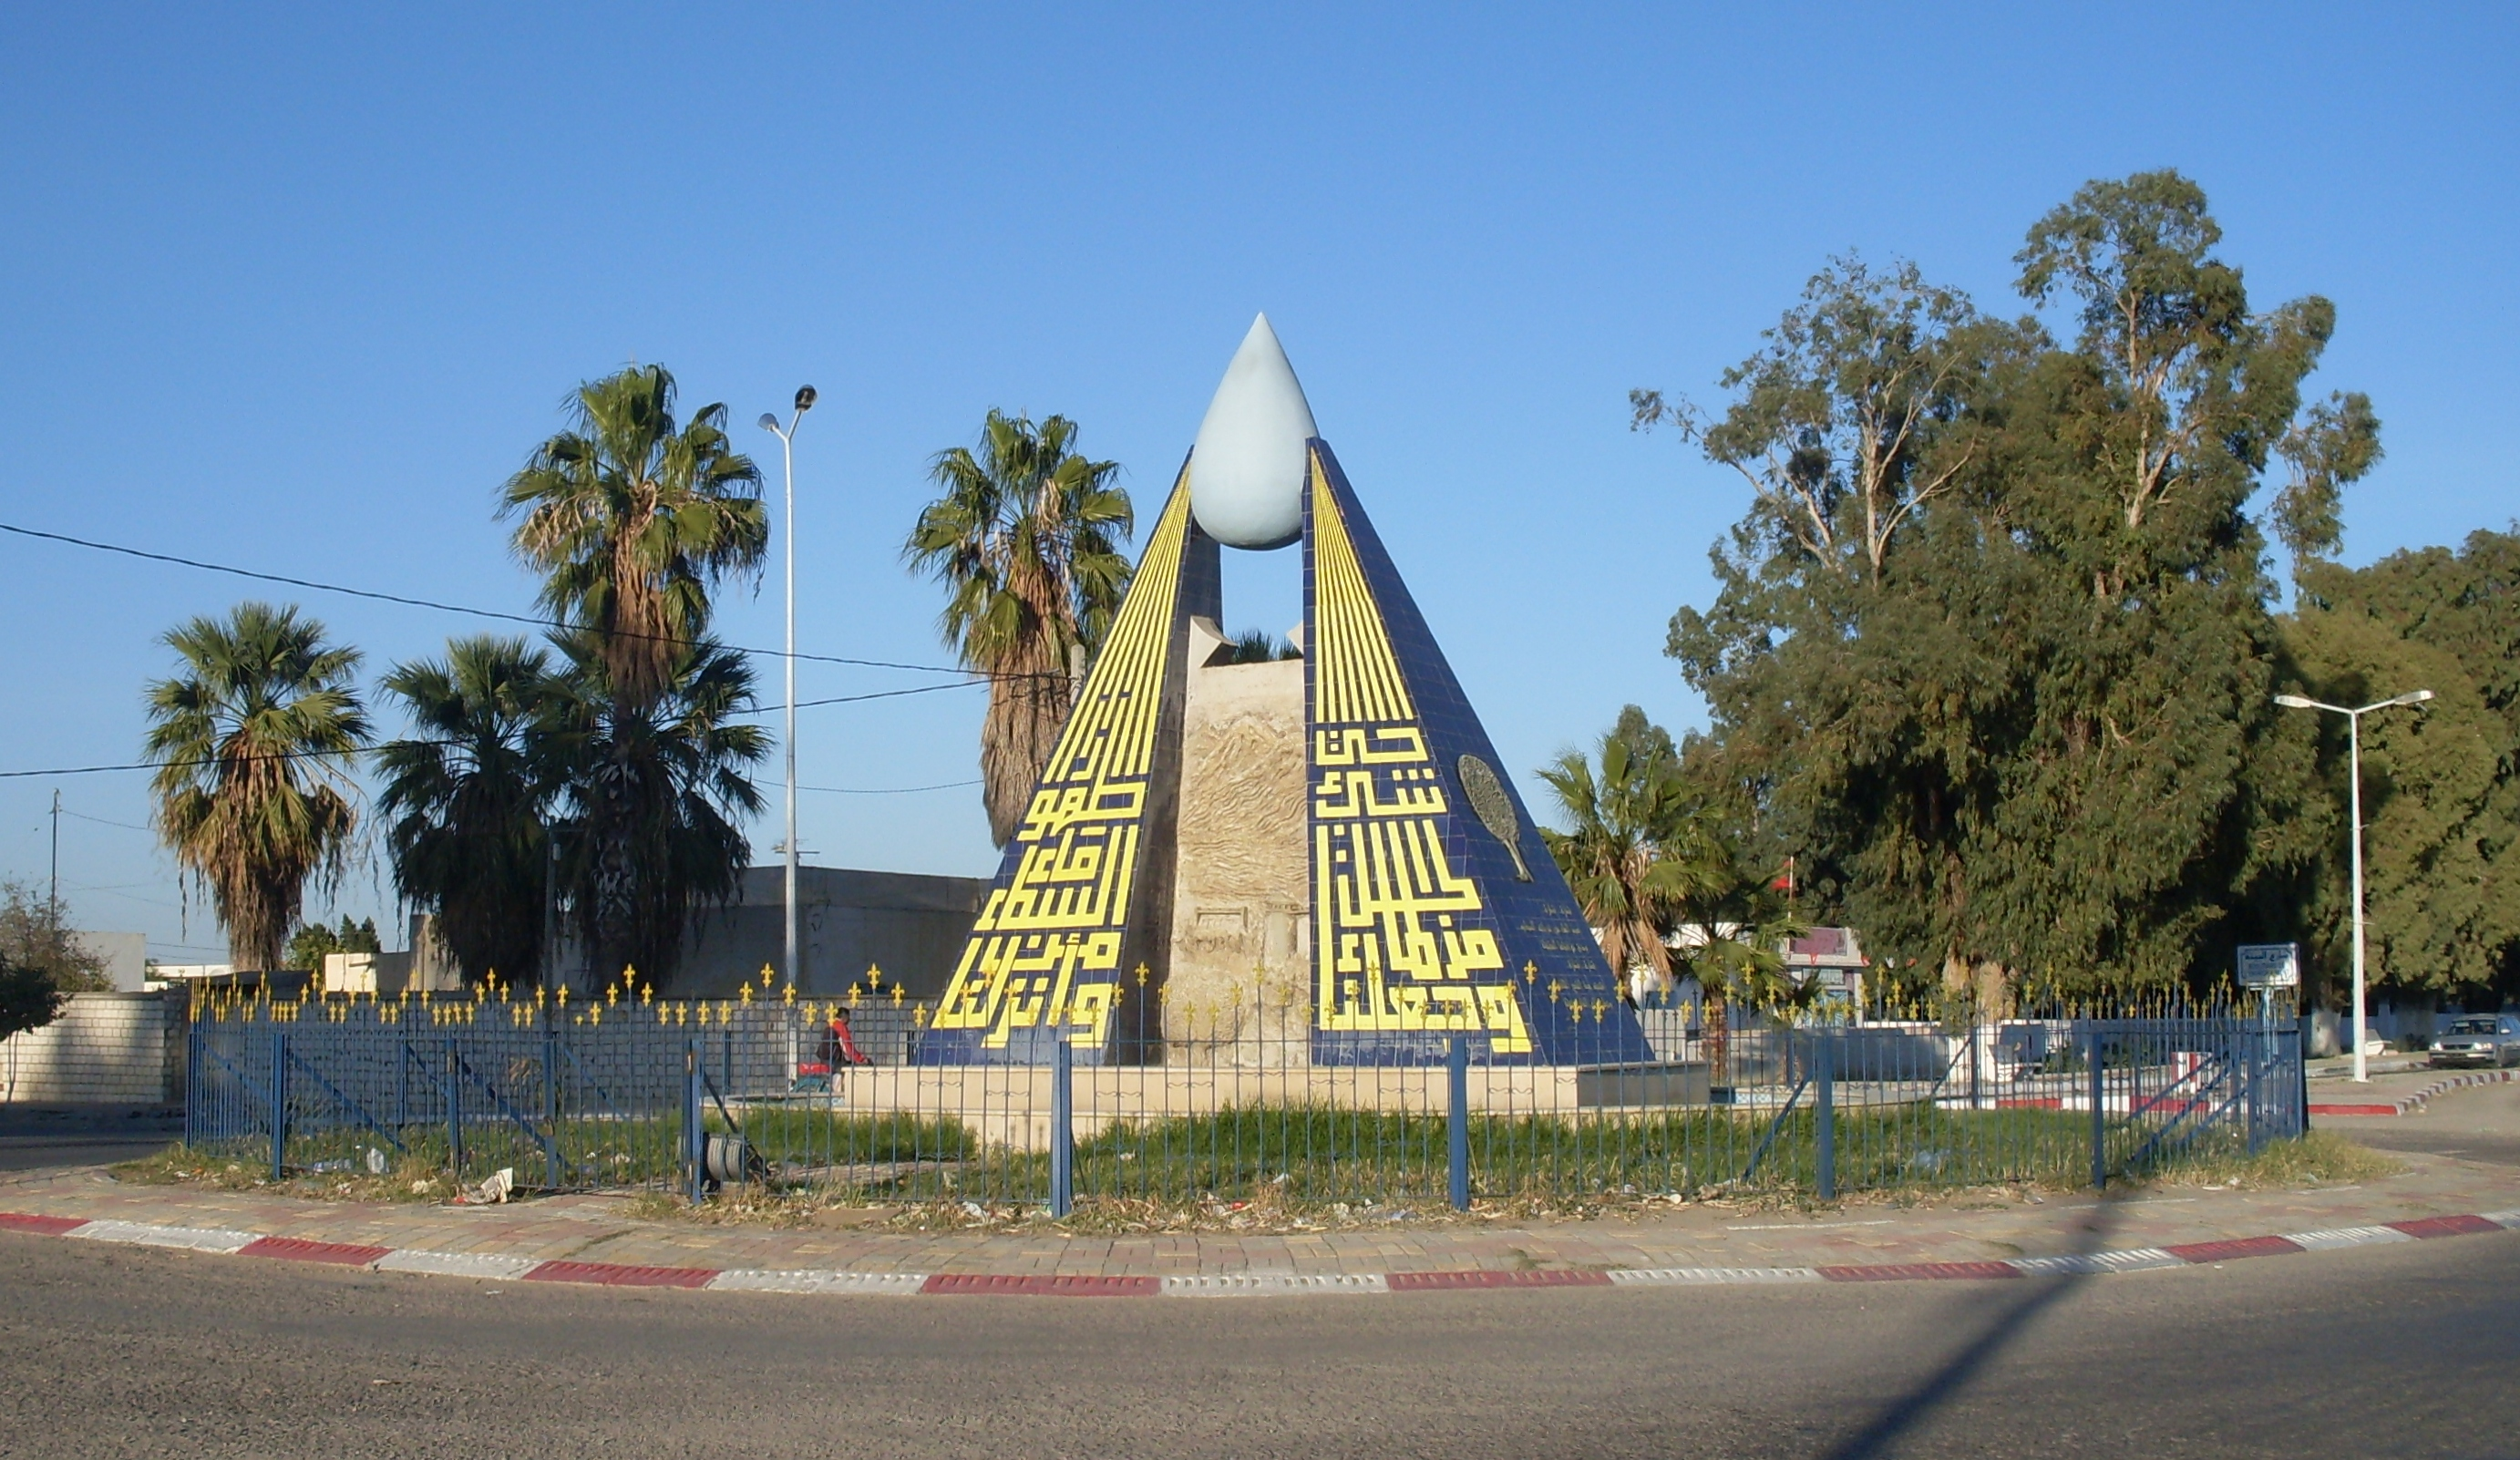 Kairouan Tunisie File:tunisie Chebika Kairouan